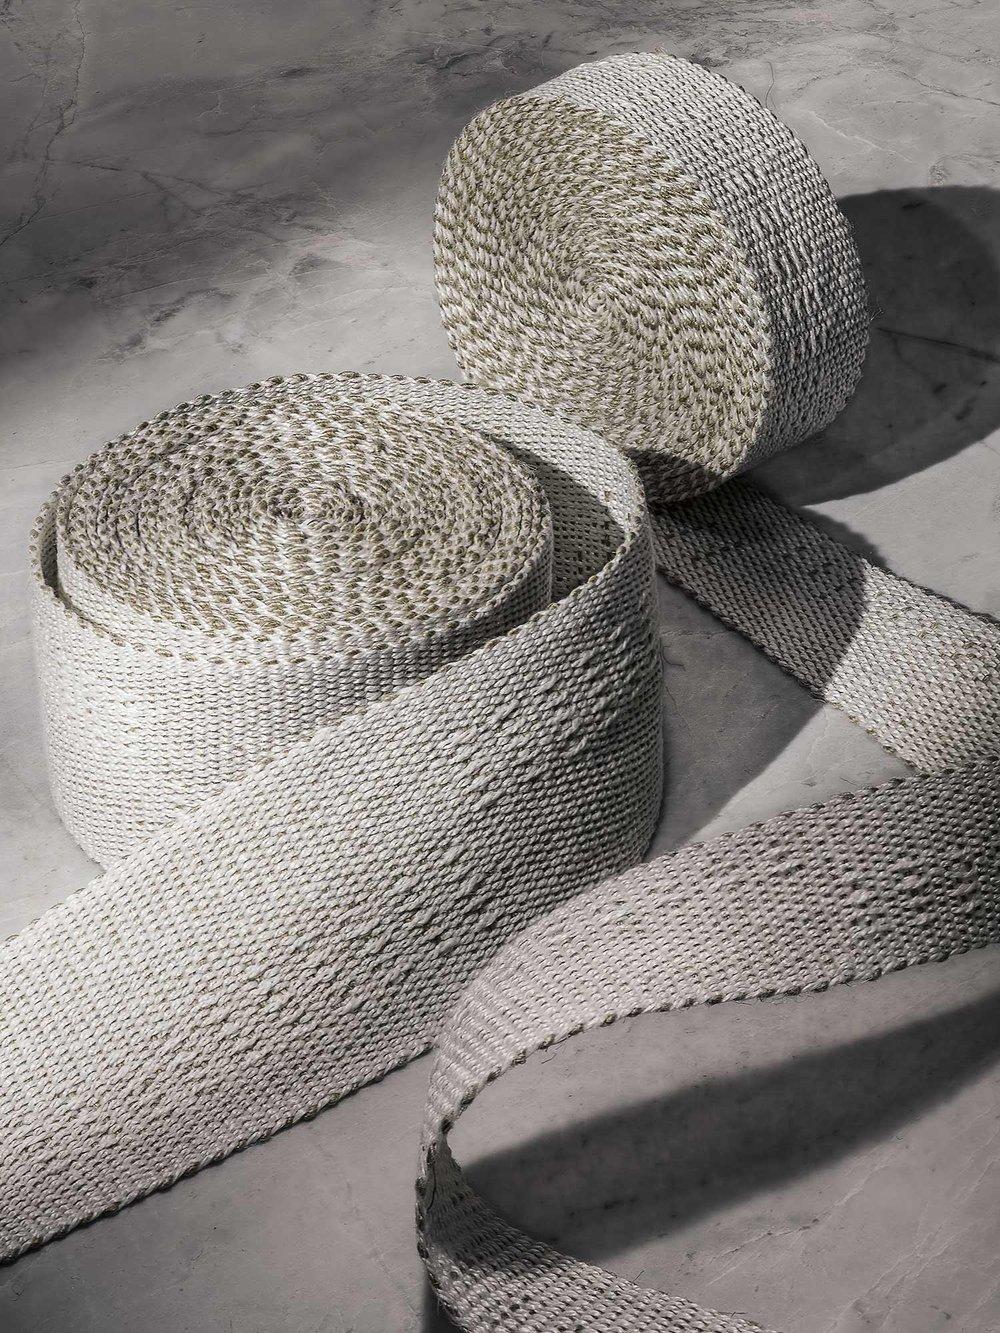 Long Blocks Handwoven Linen Tape, medium and narrow